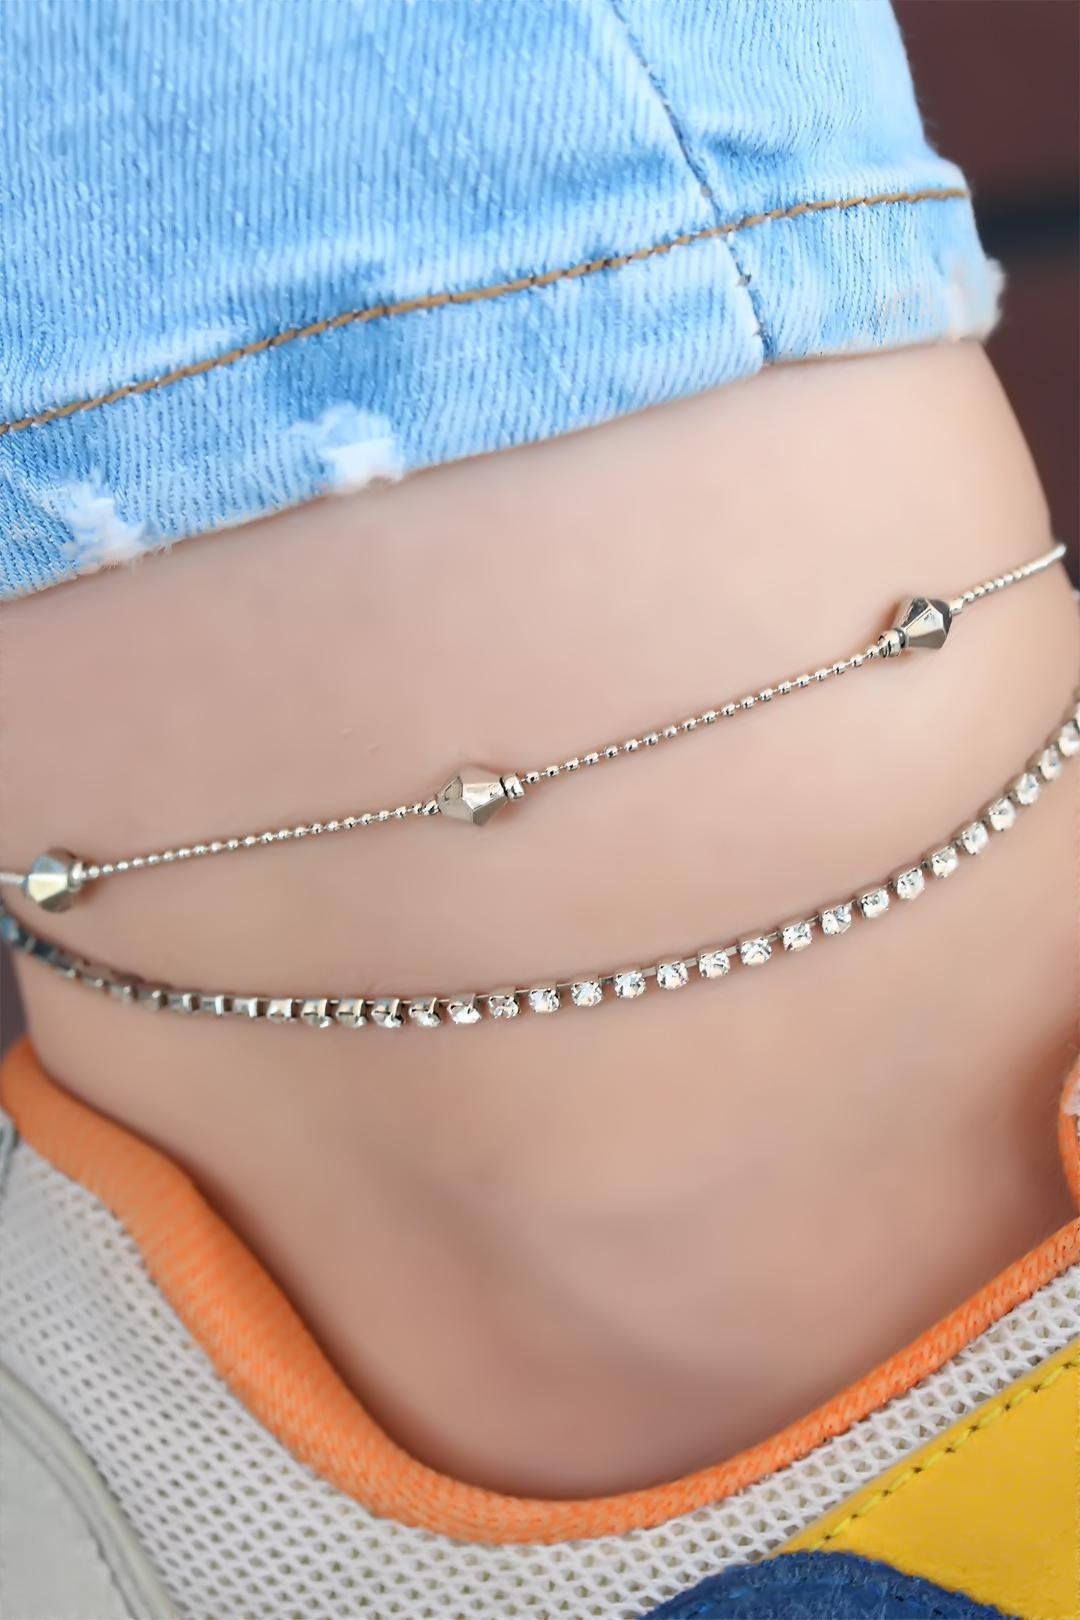 Çift Zincir Silver Renk Halhal